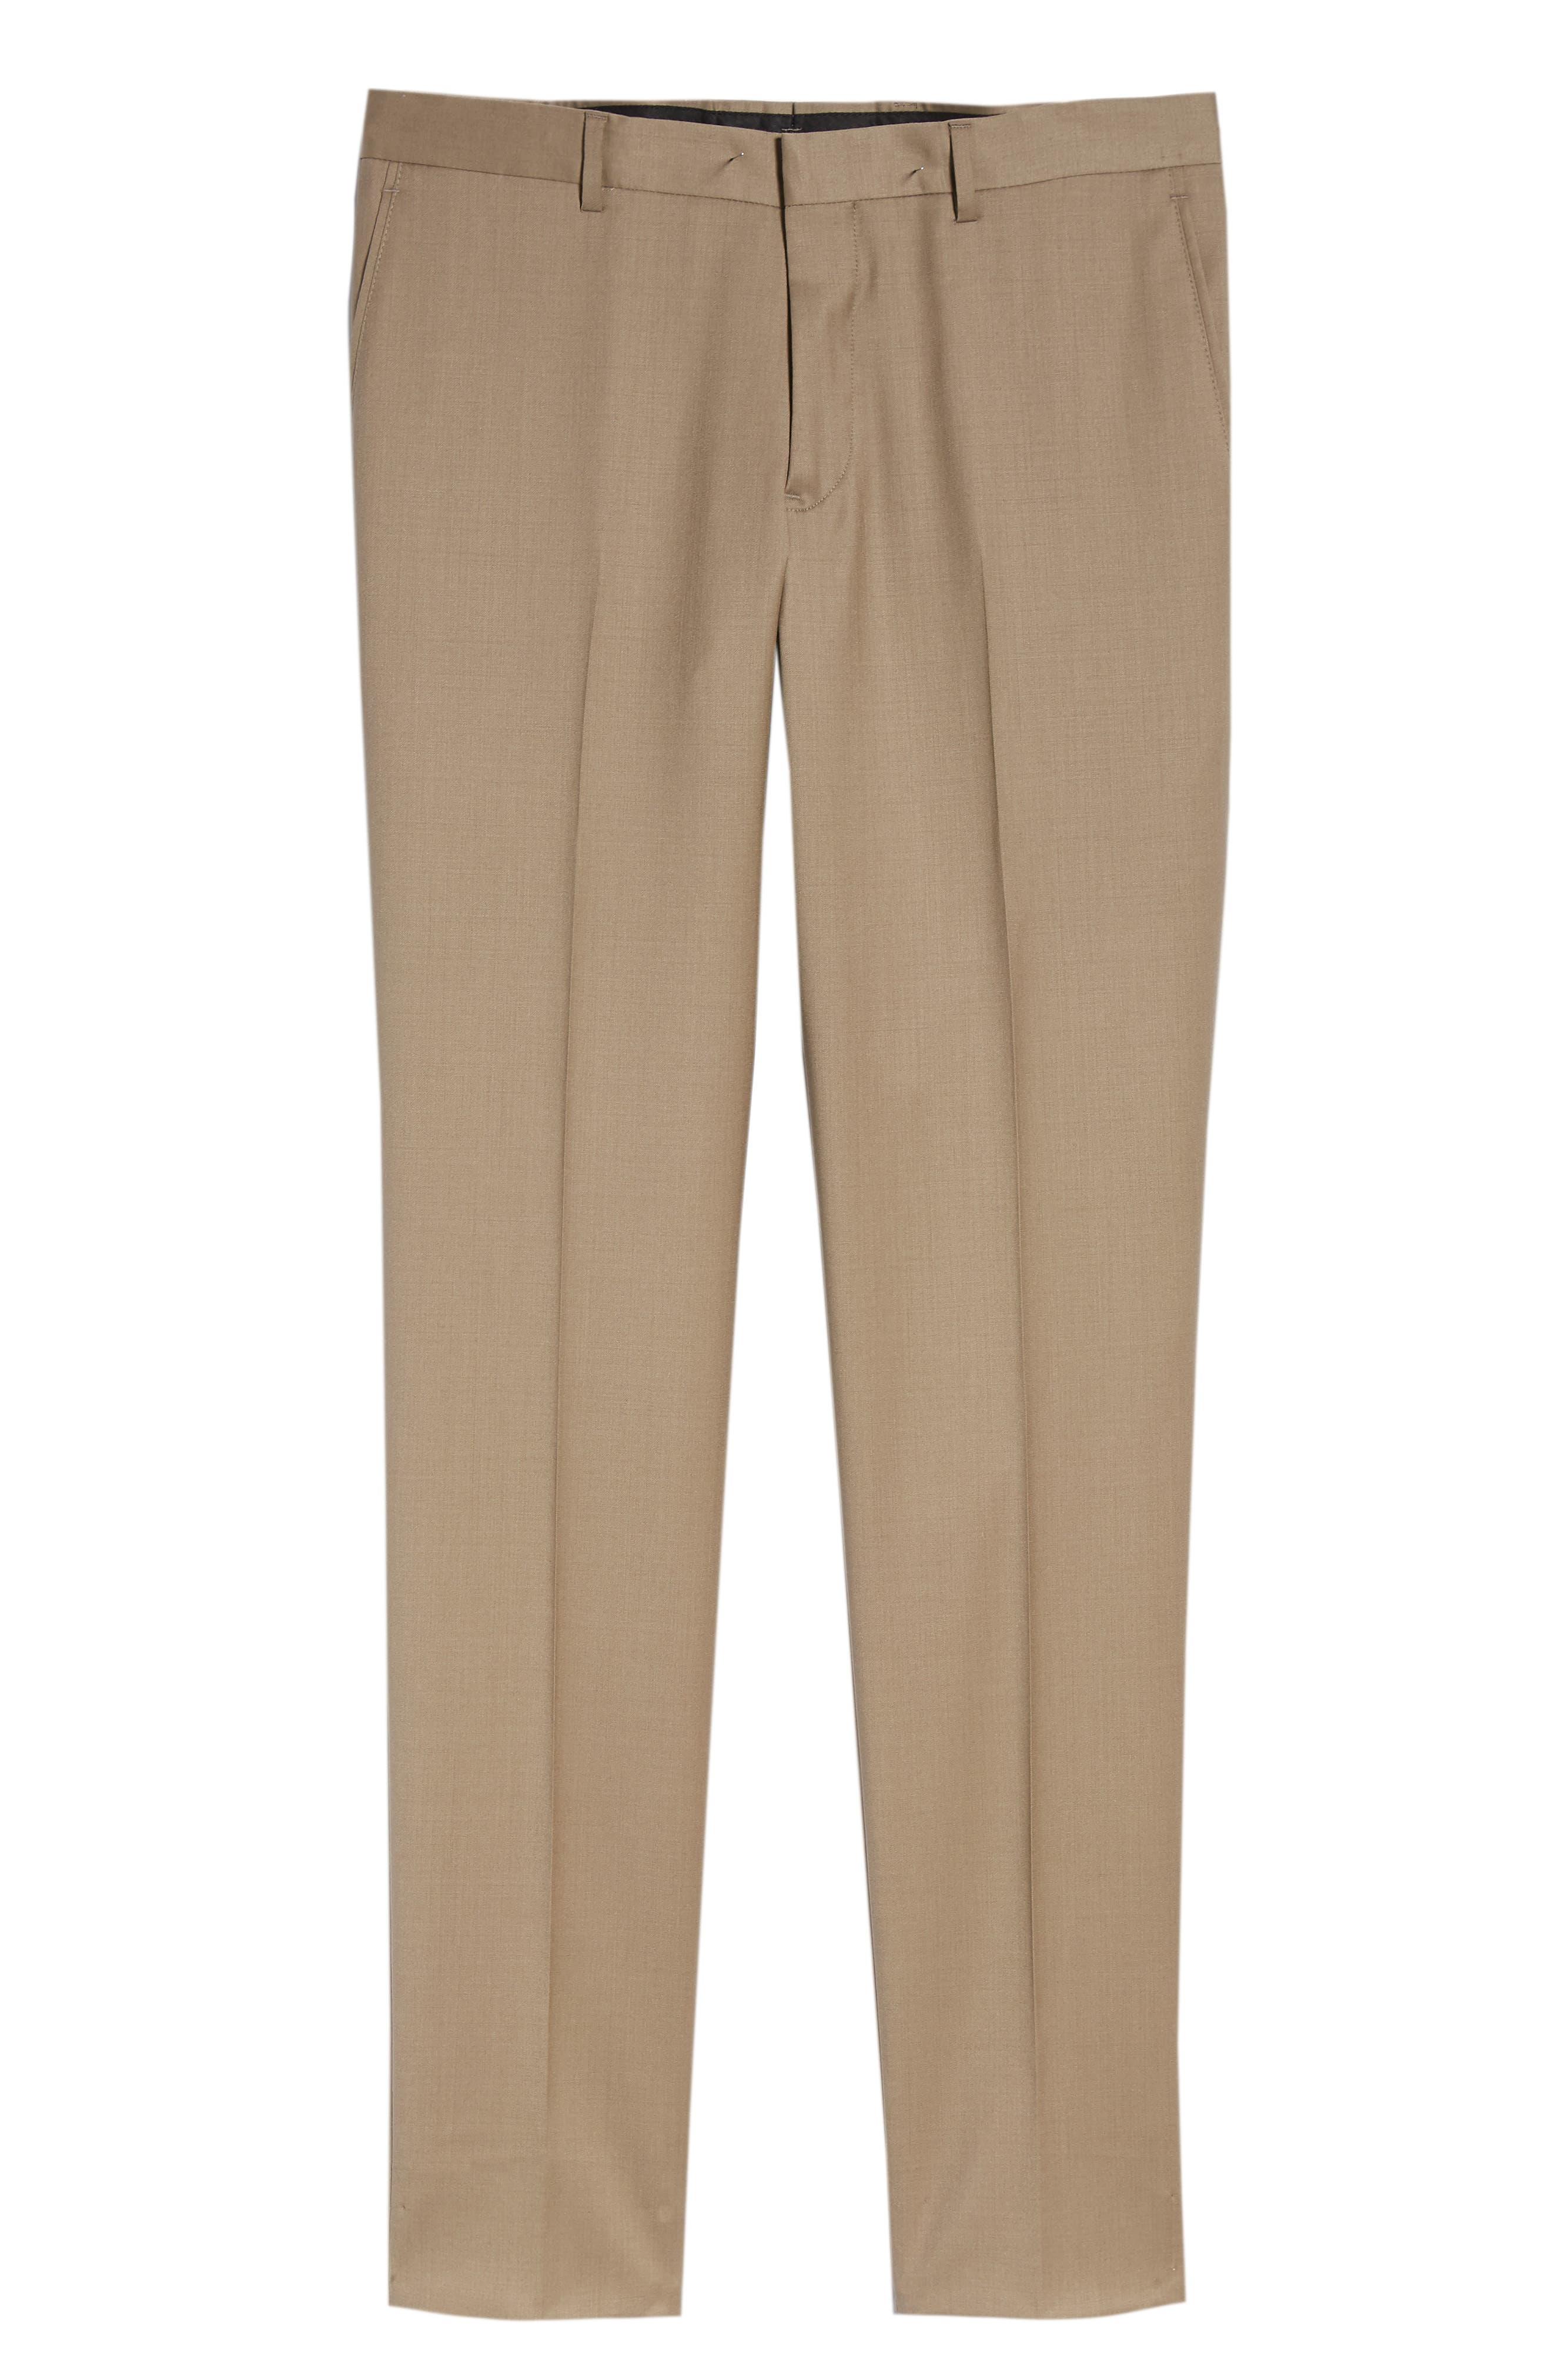 Flat Front Tech-Smart Extra Trim Trousers,                             Alternate thumbnail 4, color,                             Tan